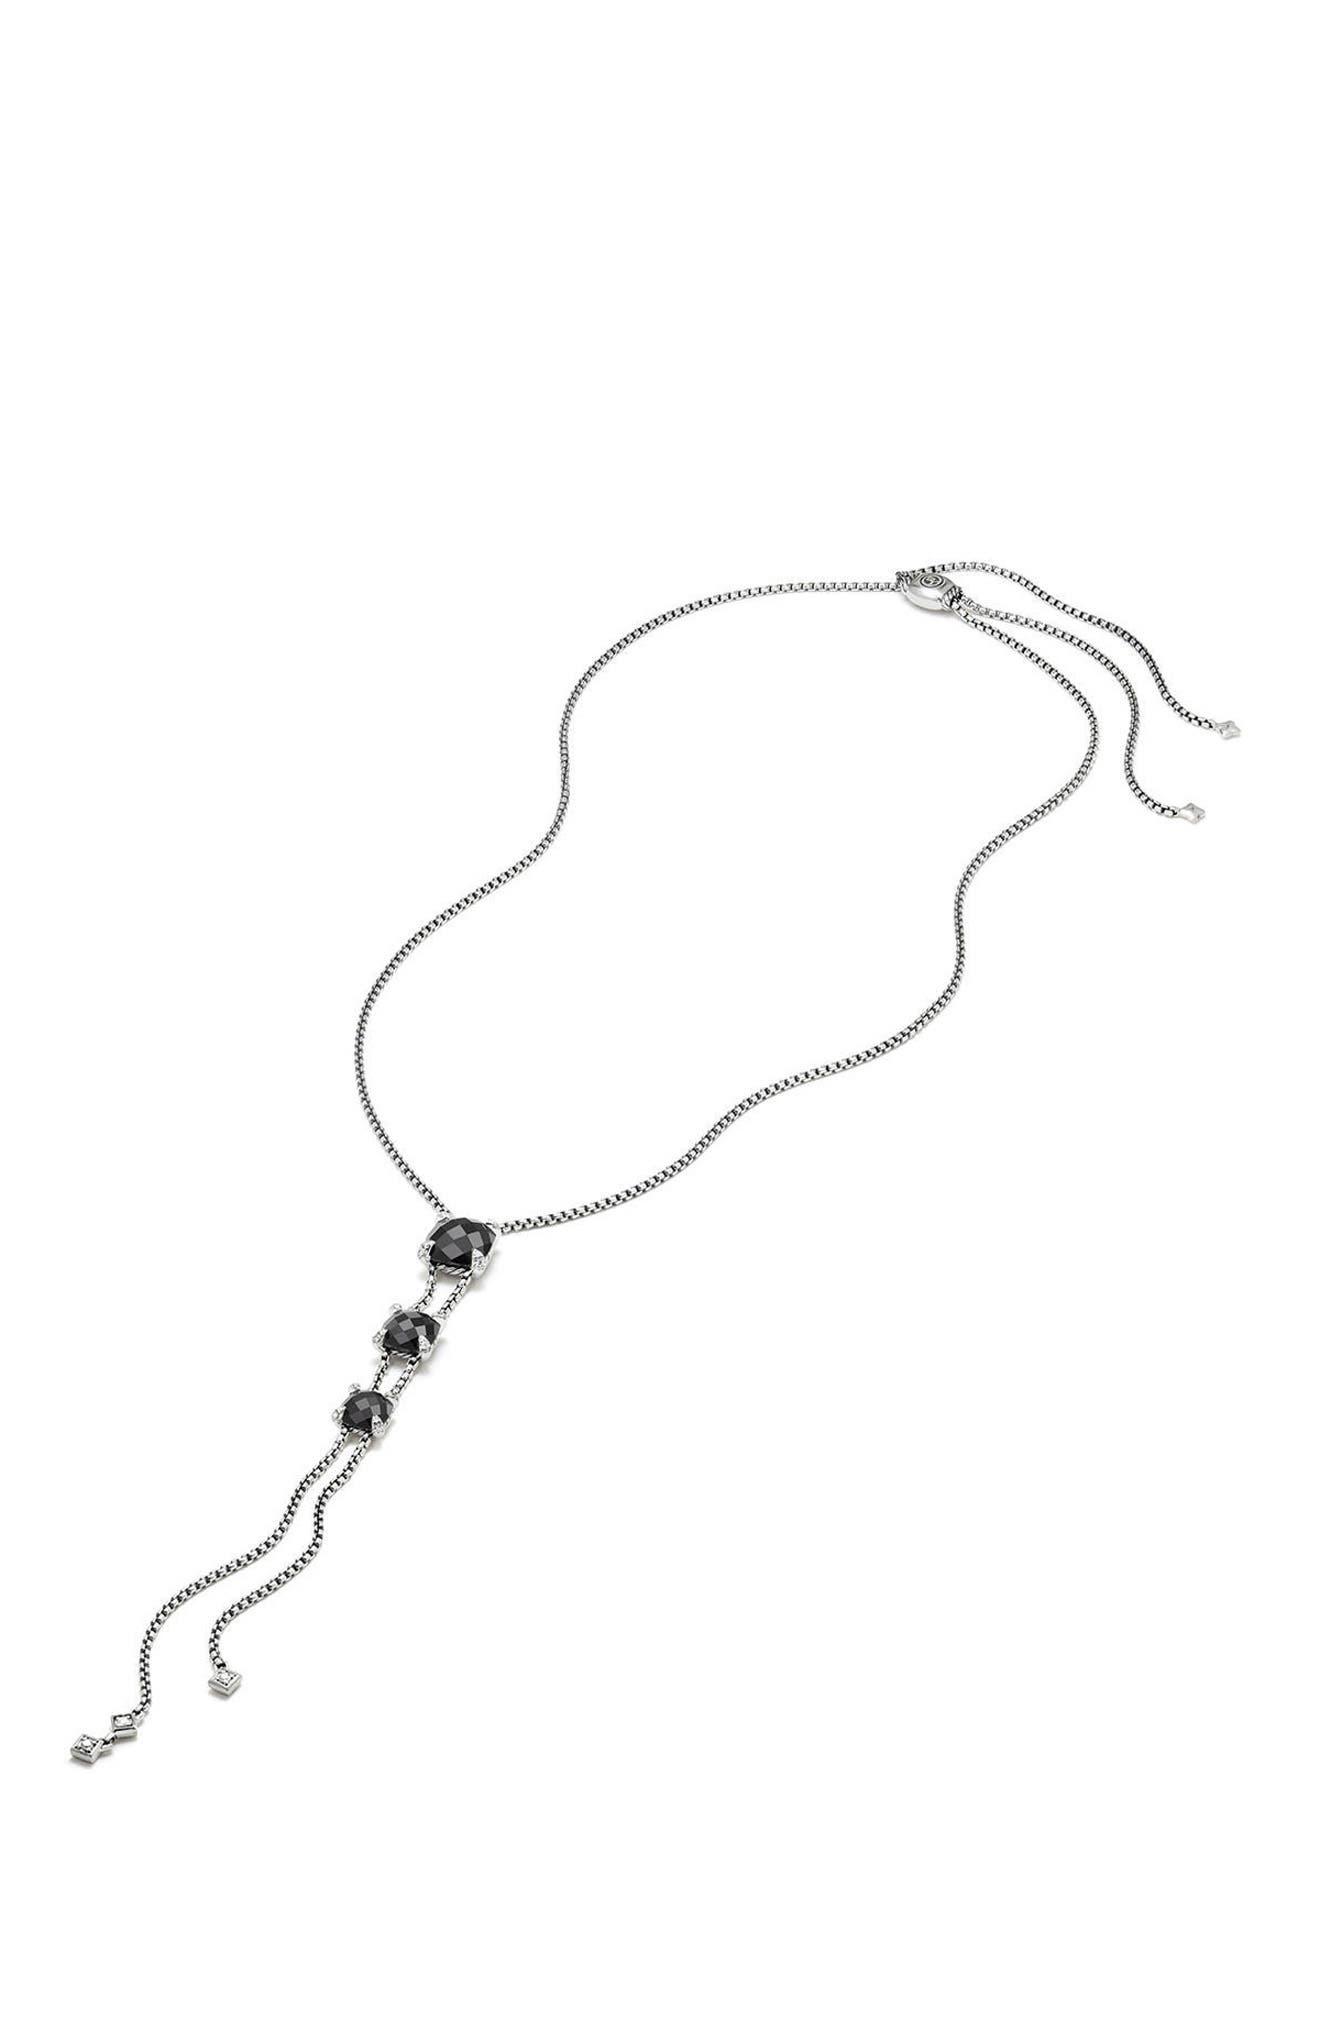 Châtelaine Y-Necklace with Diamonds,                             Alternate thumbnail 4, color,                             BLACK ONYX?